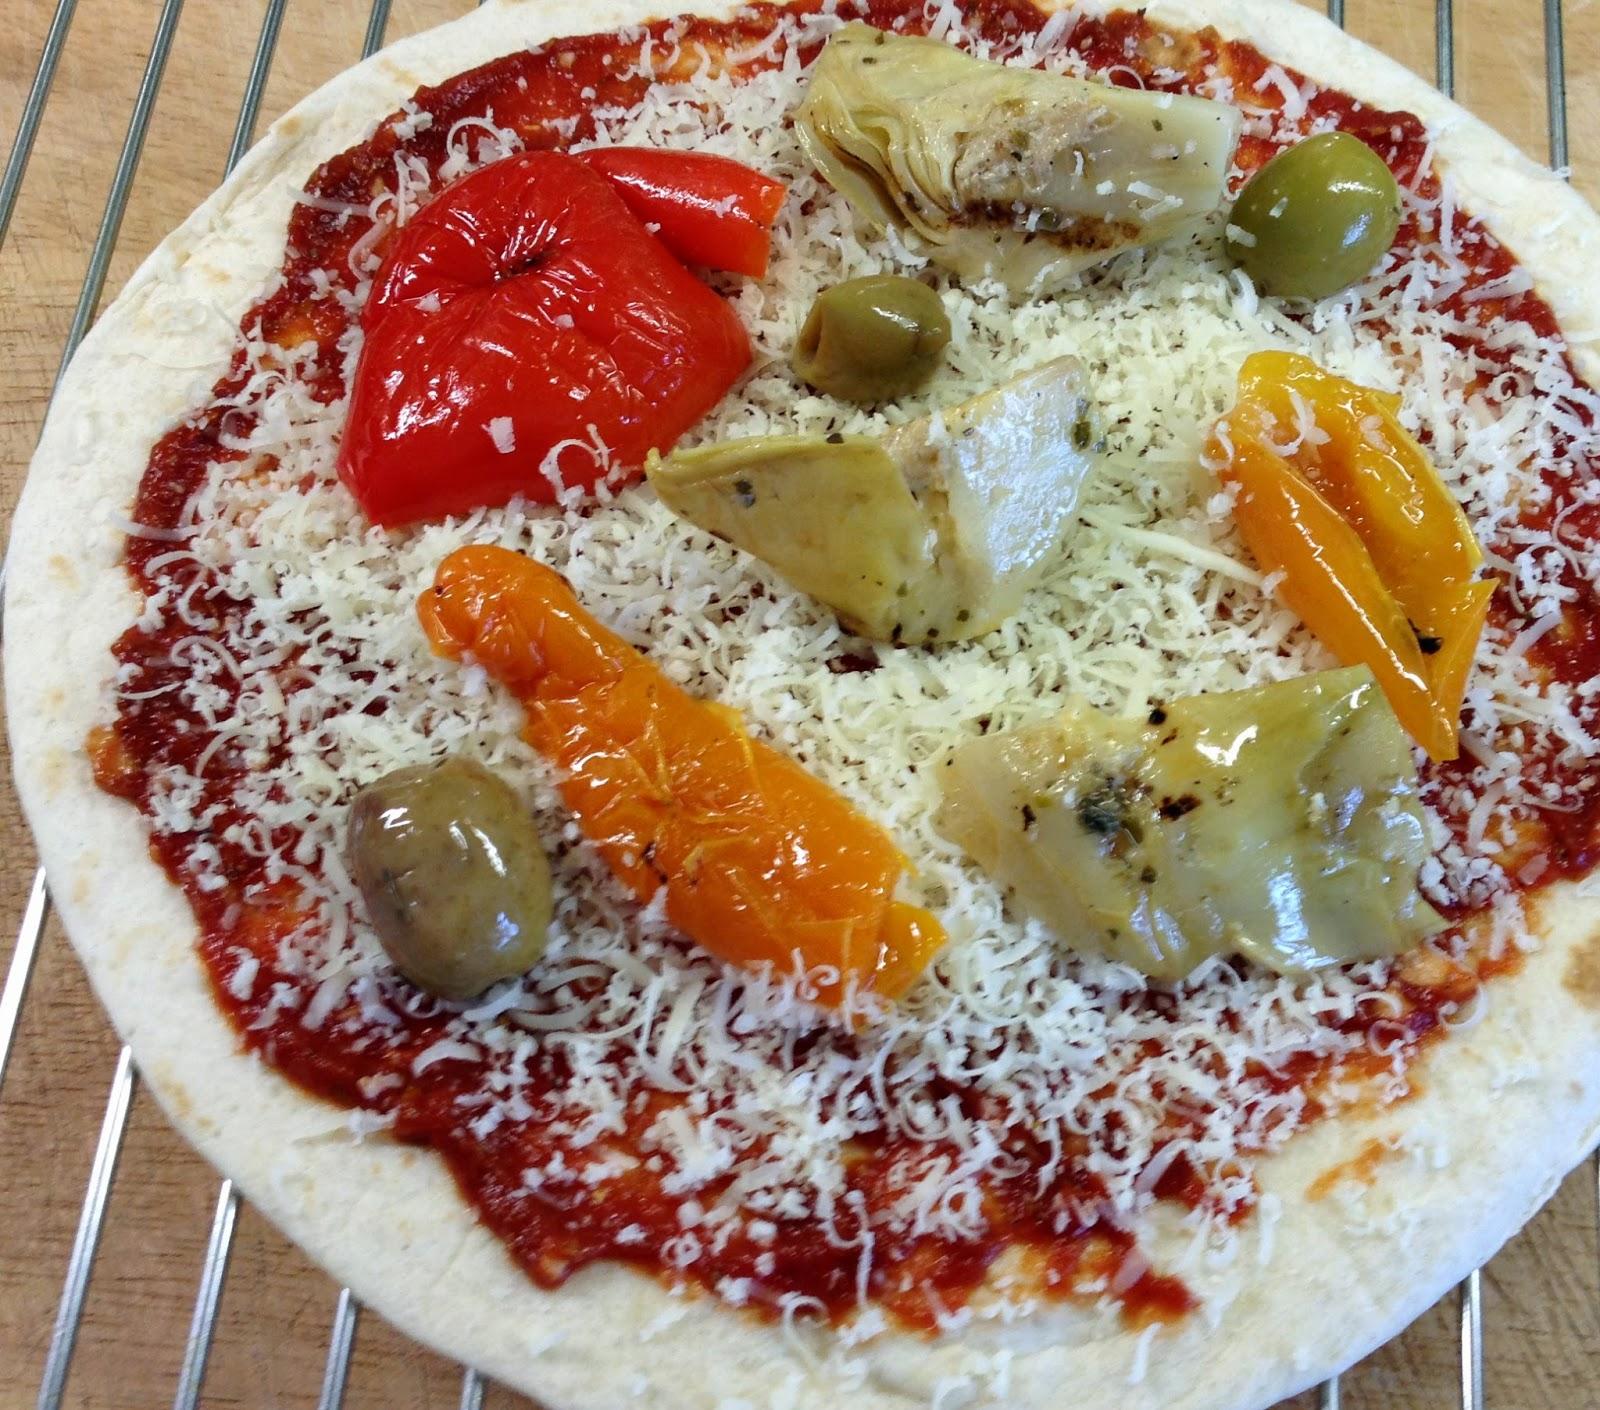 Pizza made from flour tortilla